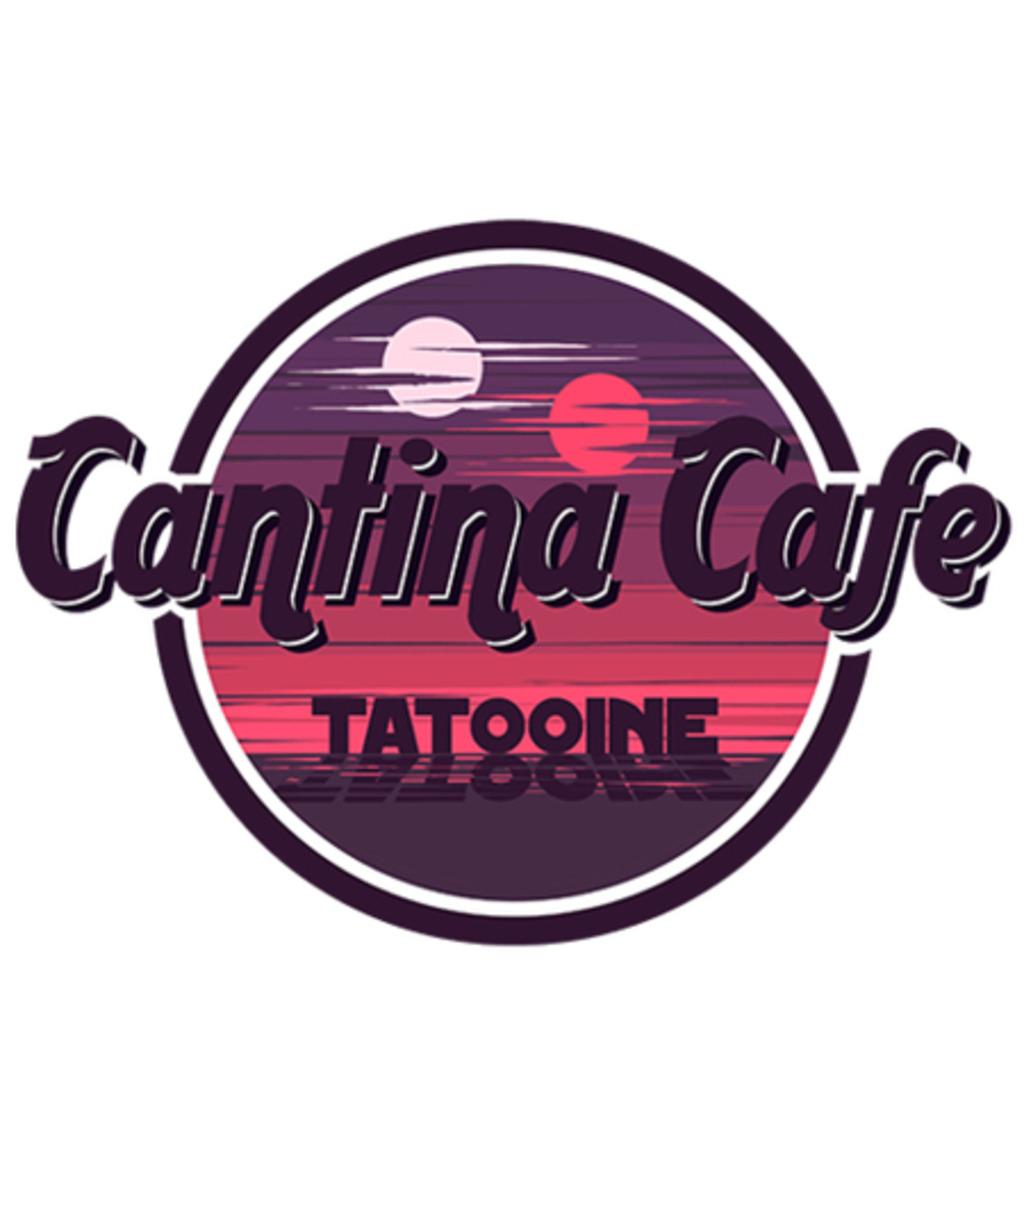 Qwertee: Cantina Tatooine